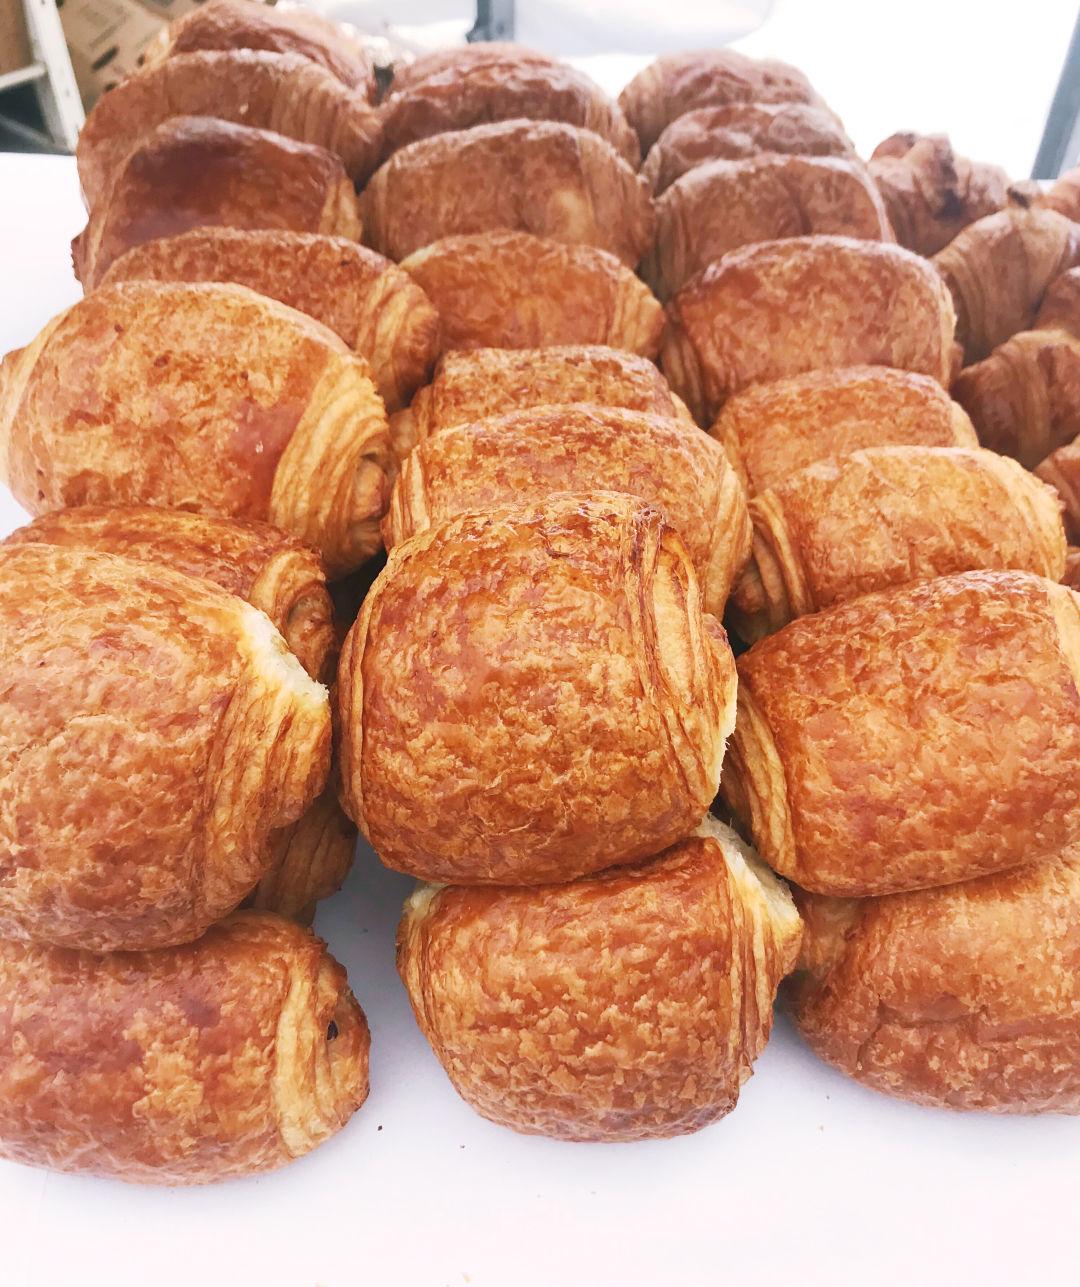 Croissants uqvi9l